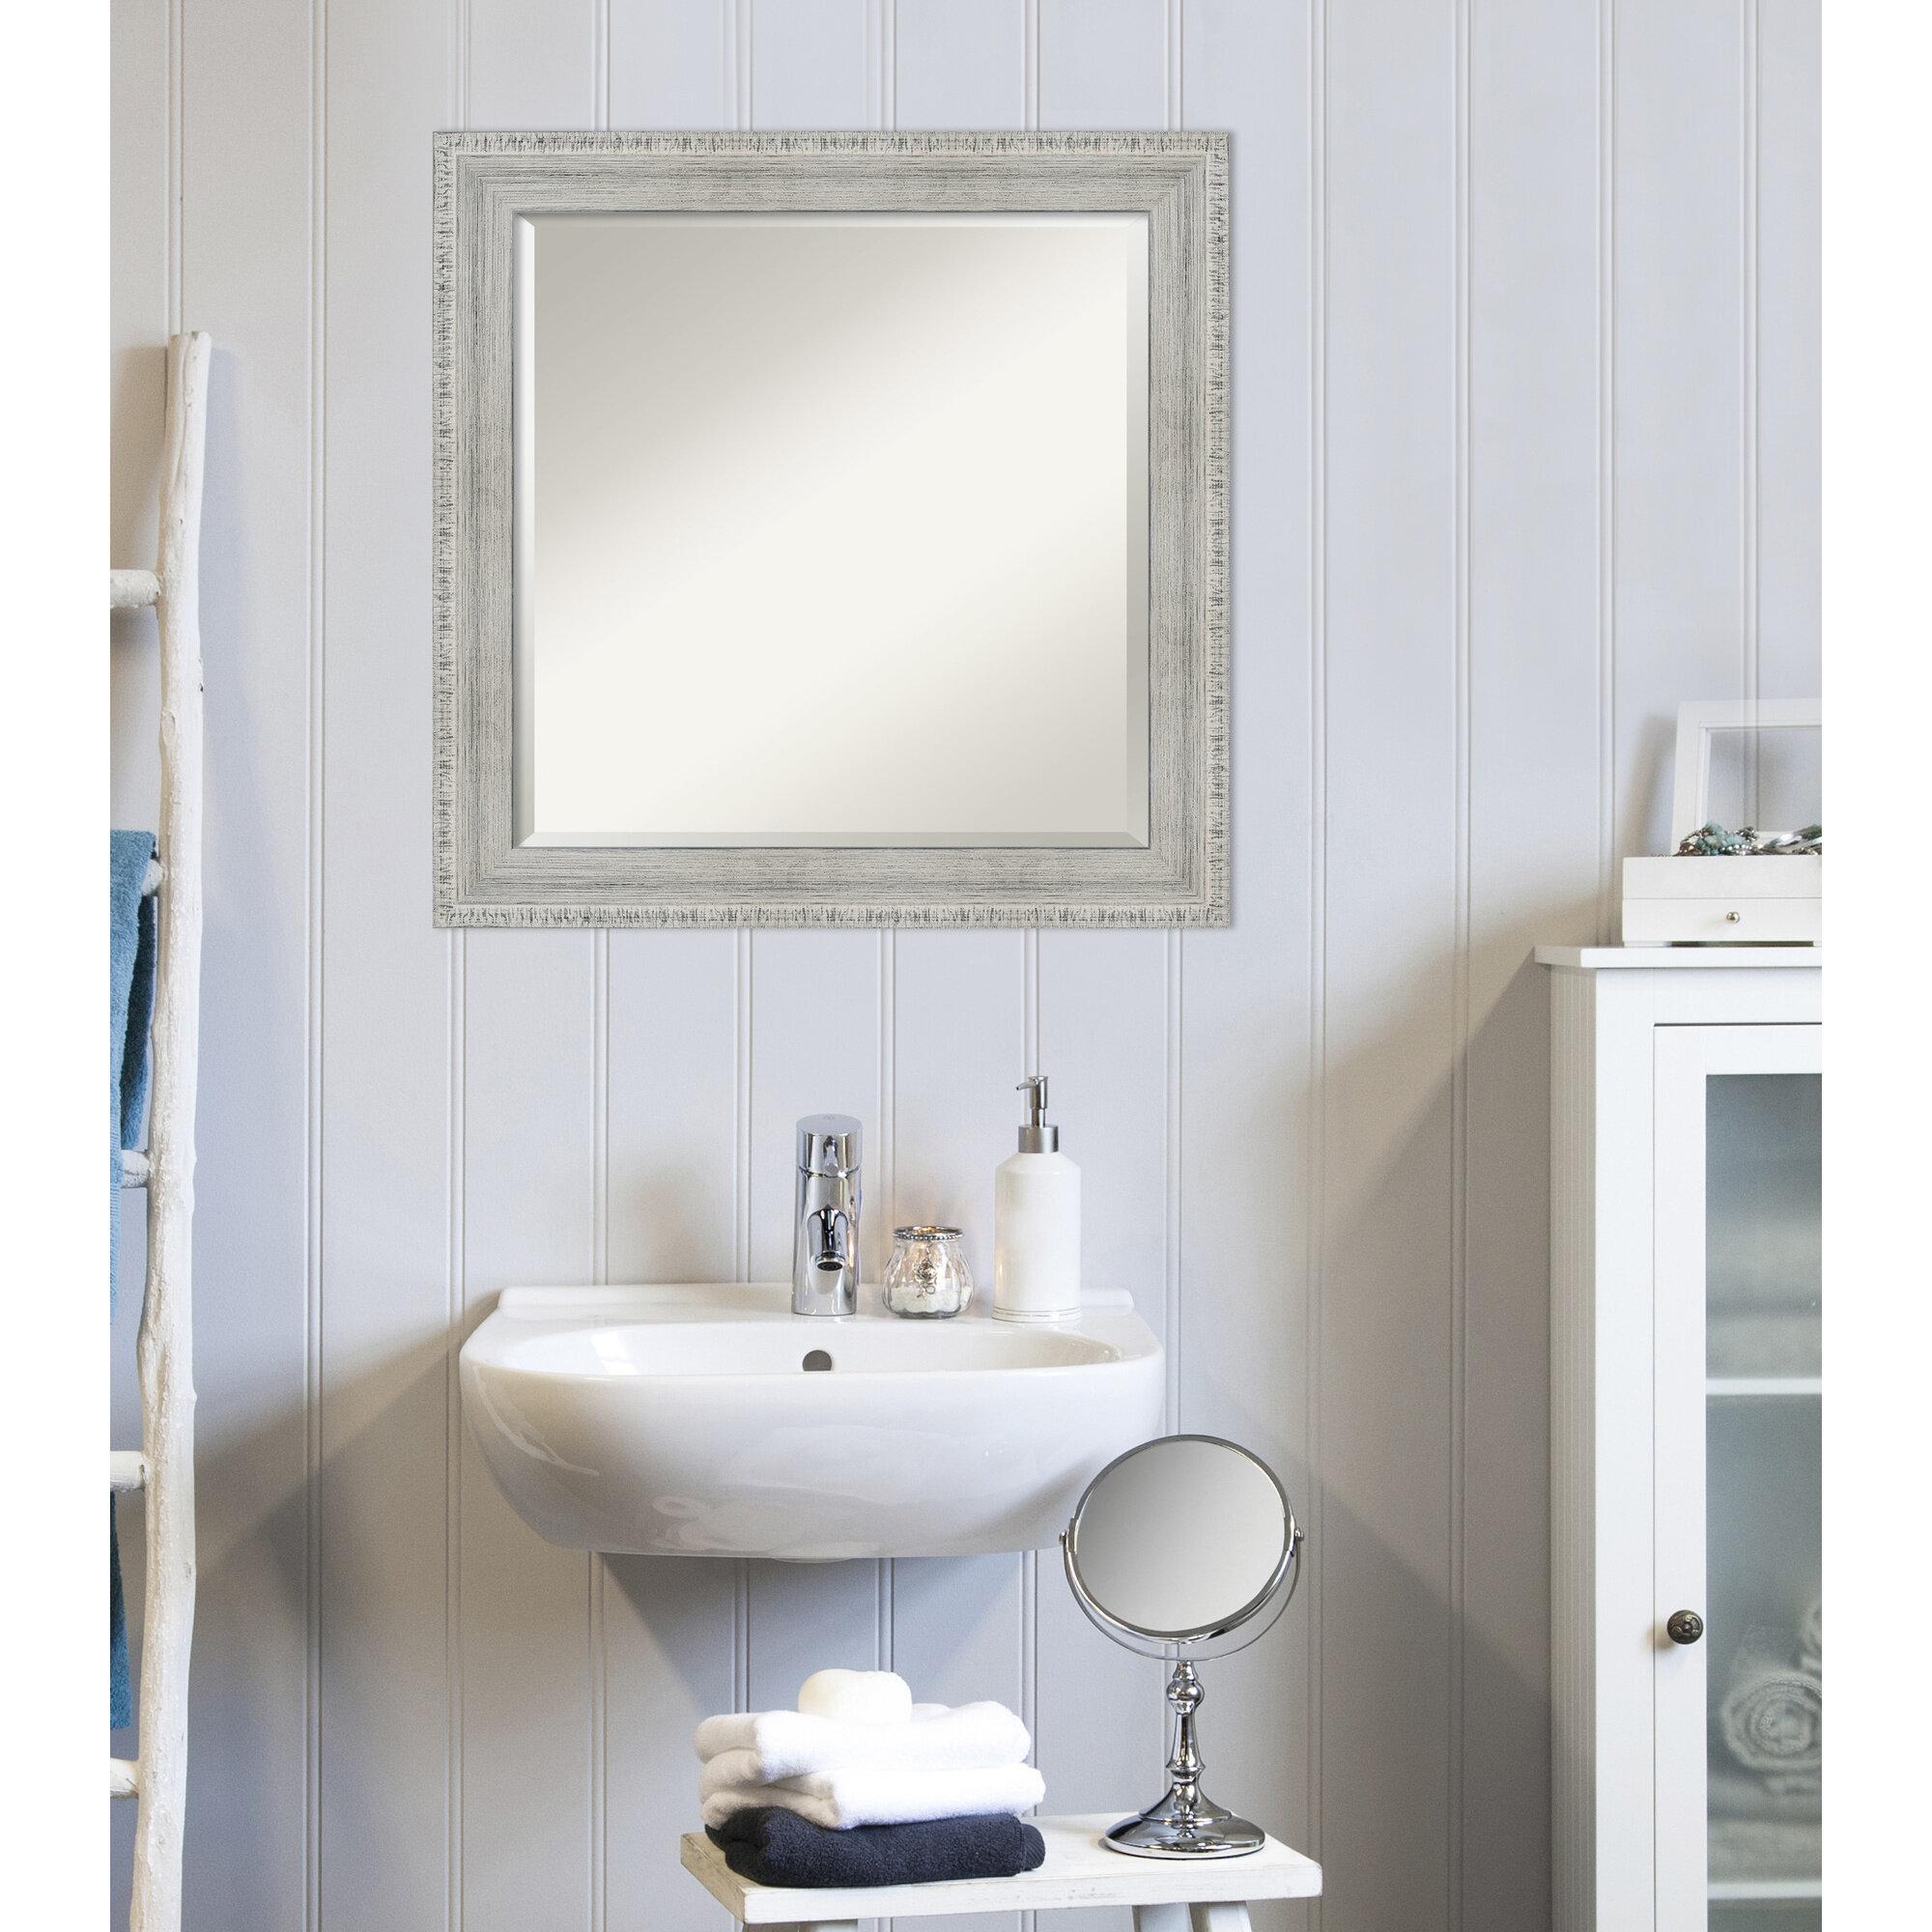 Dovecove Amare Rustic Beveled Vanity Mirror Wayfair